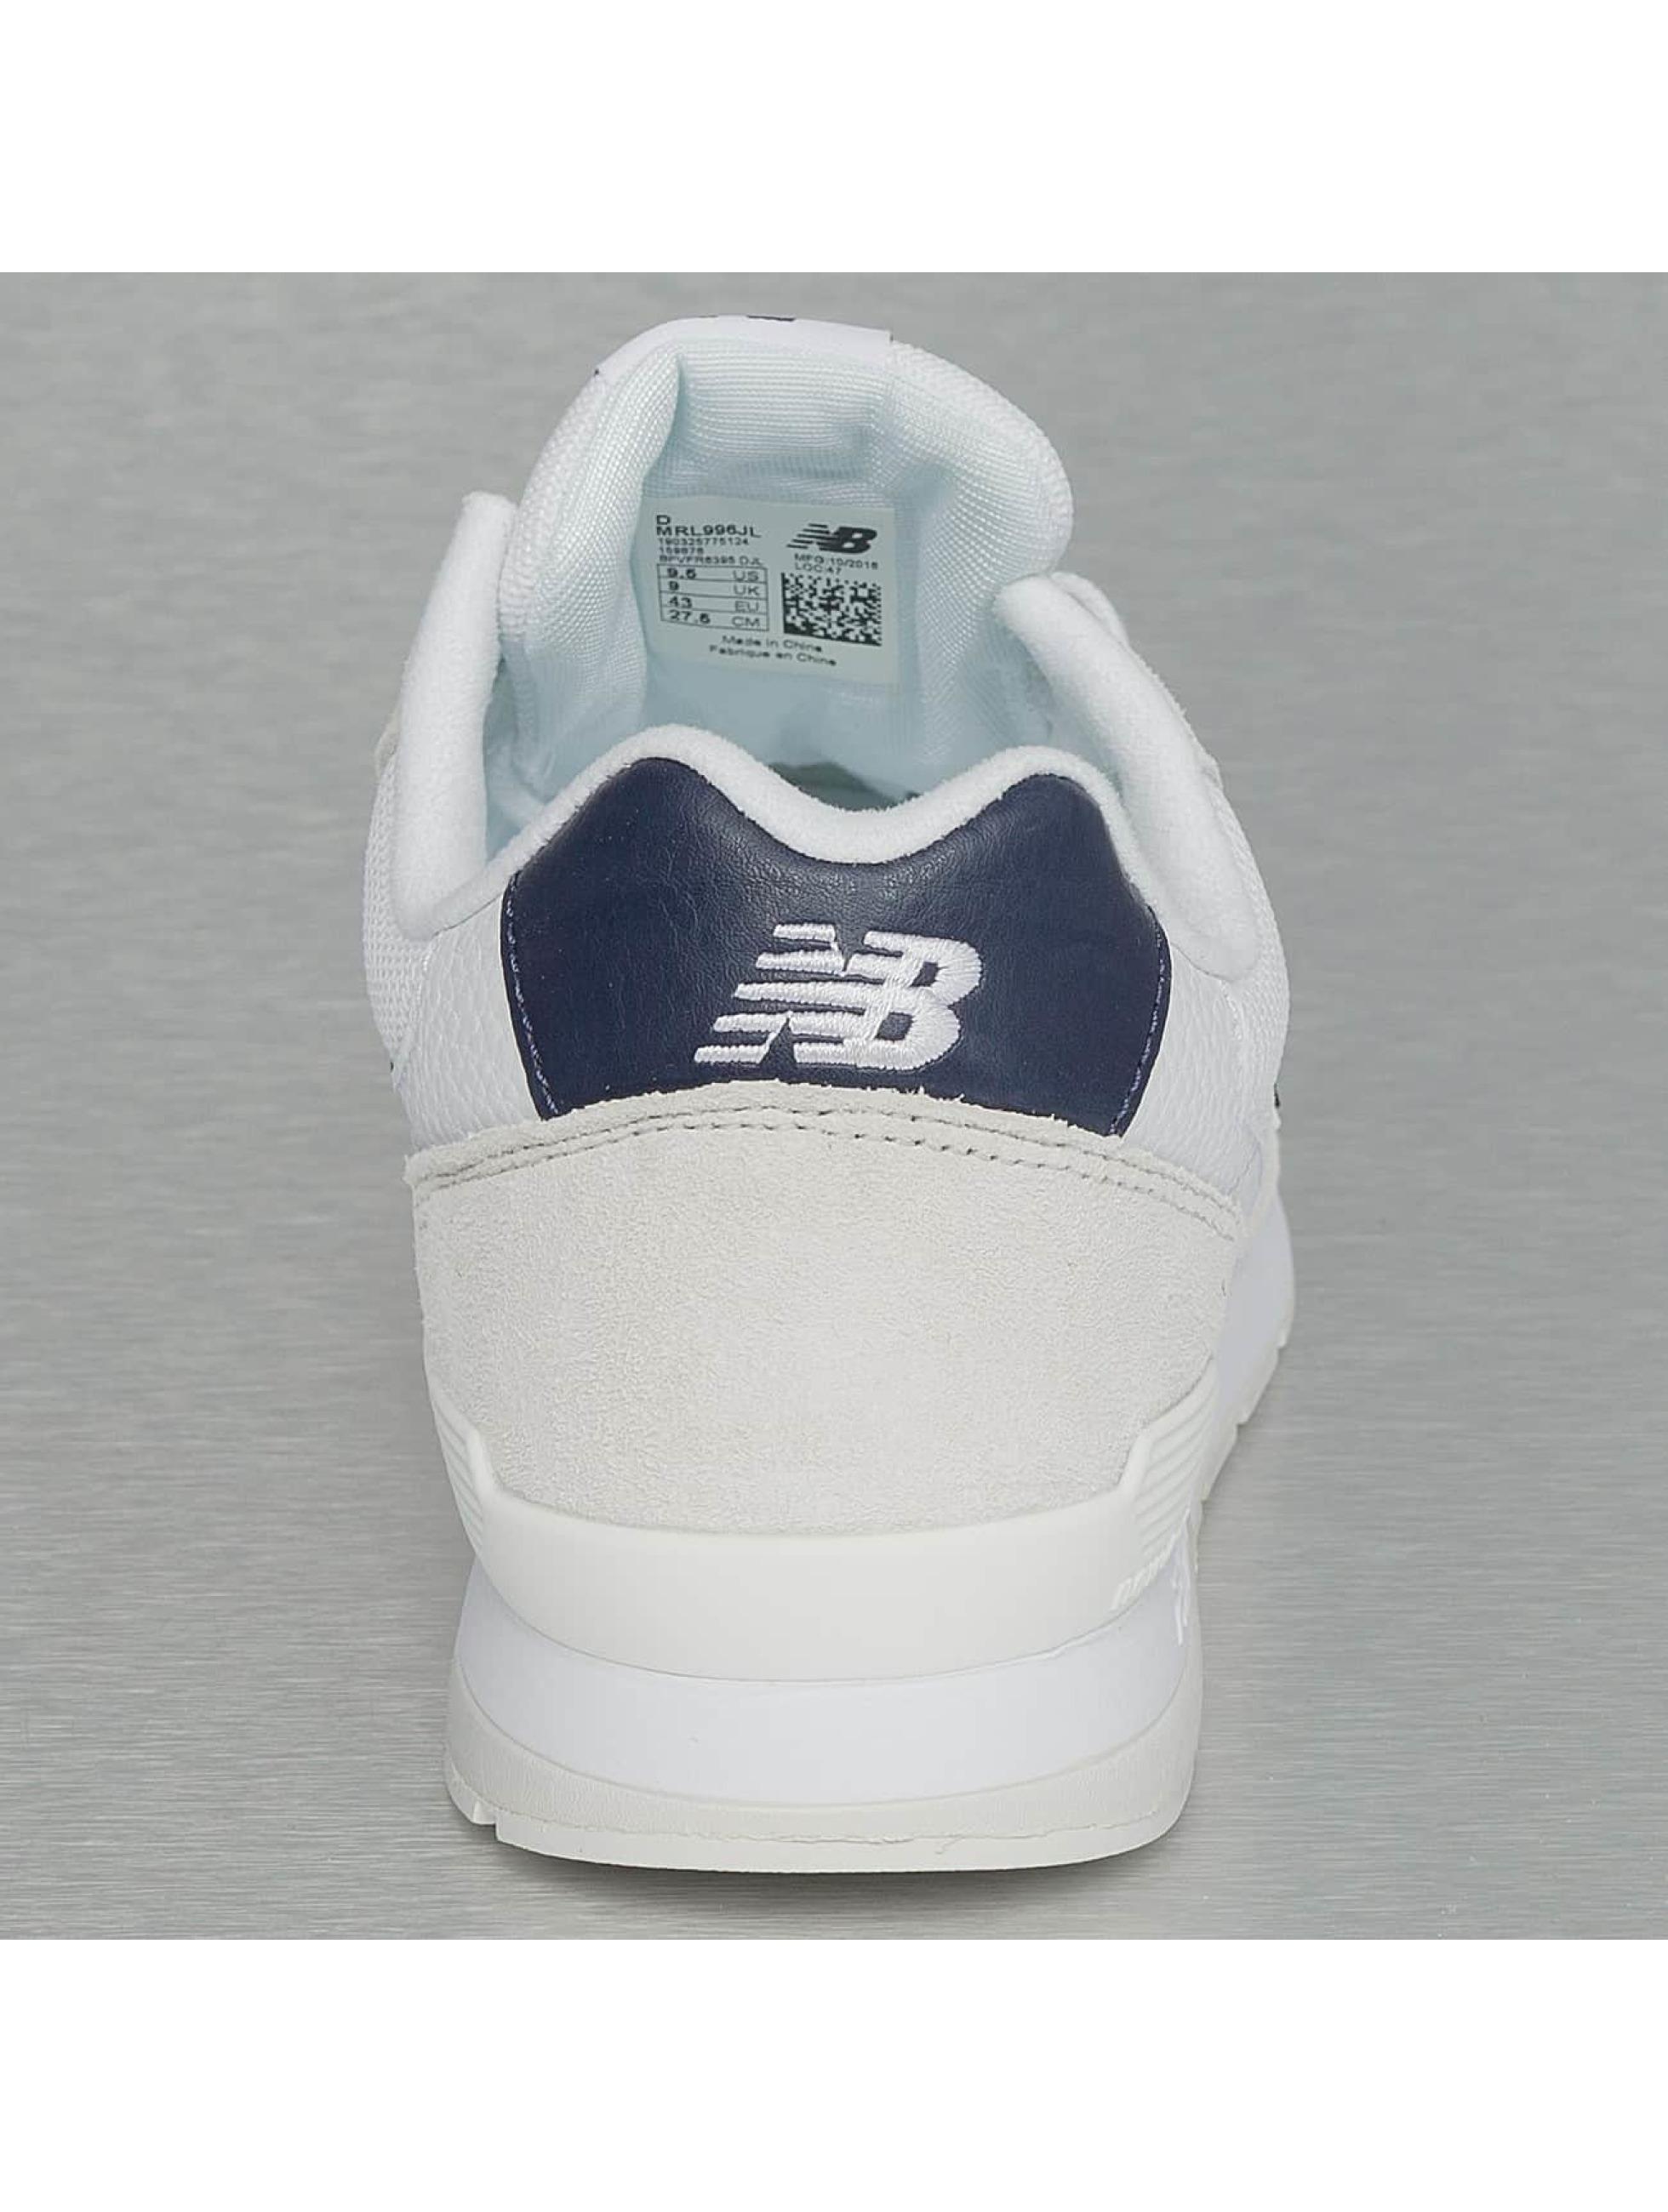 New Balance Sneakers MRL 996 JL white